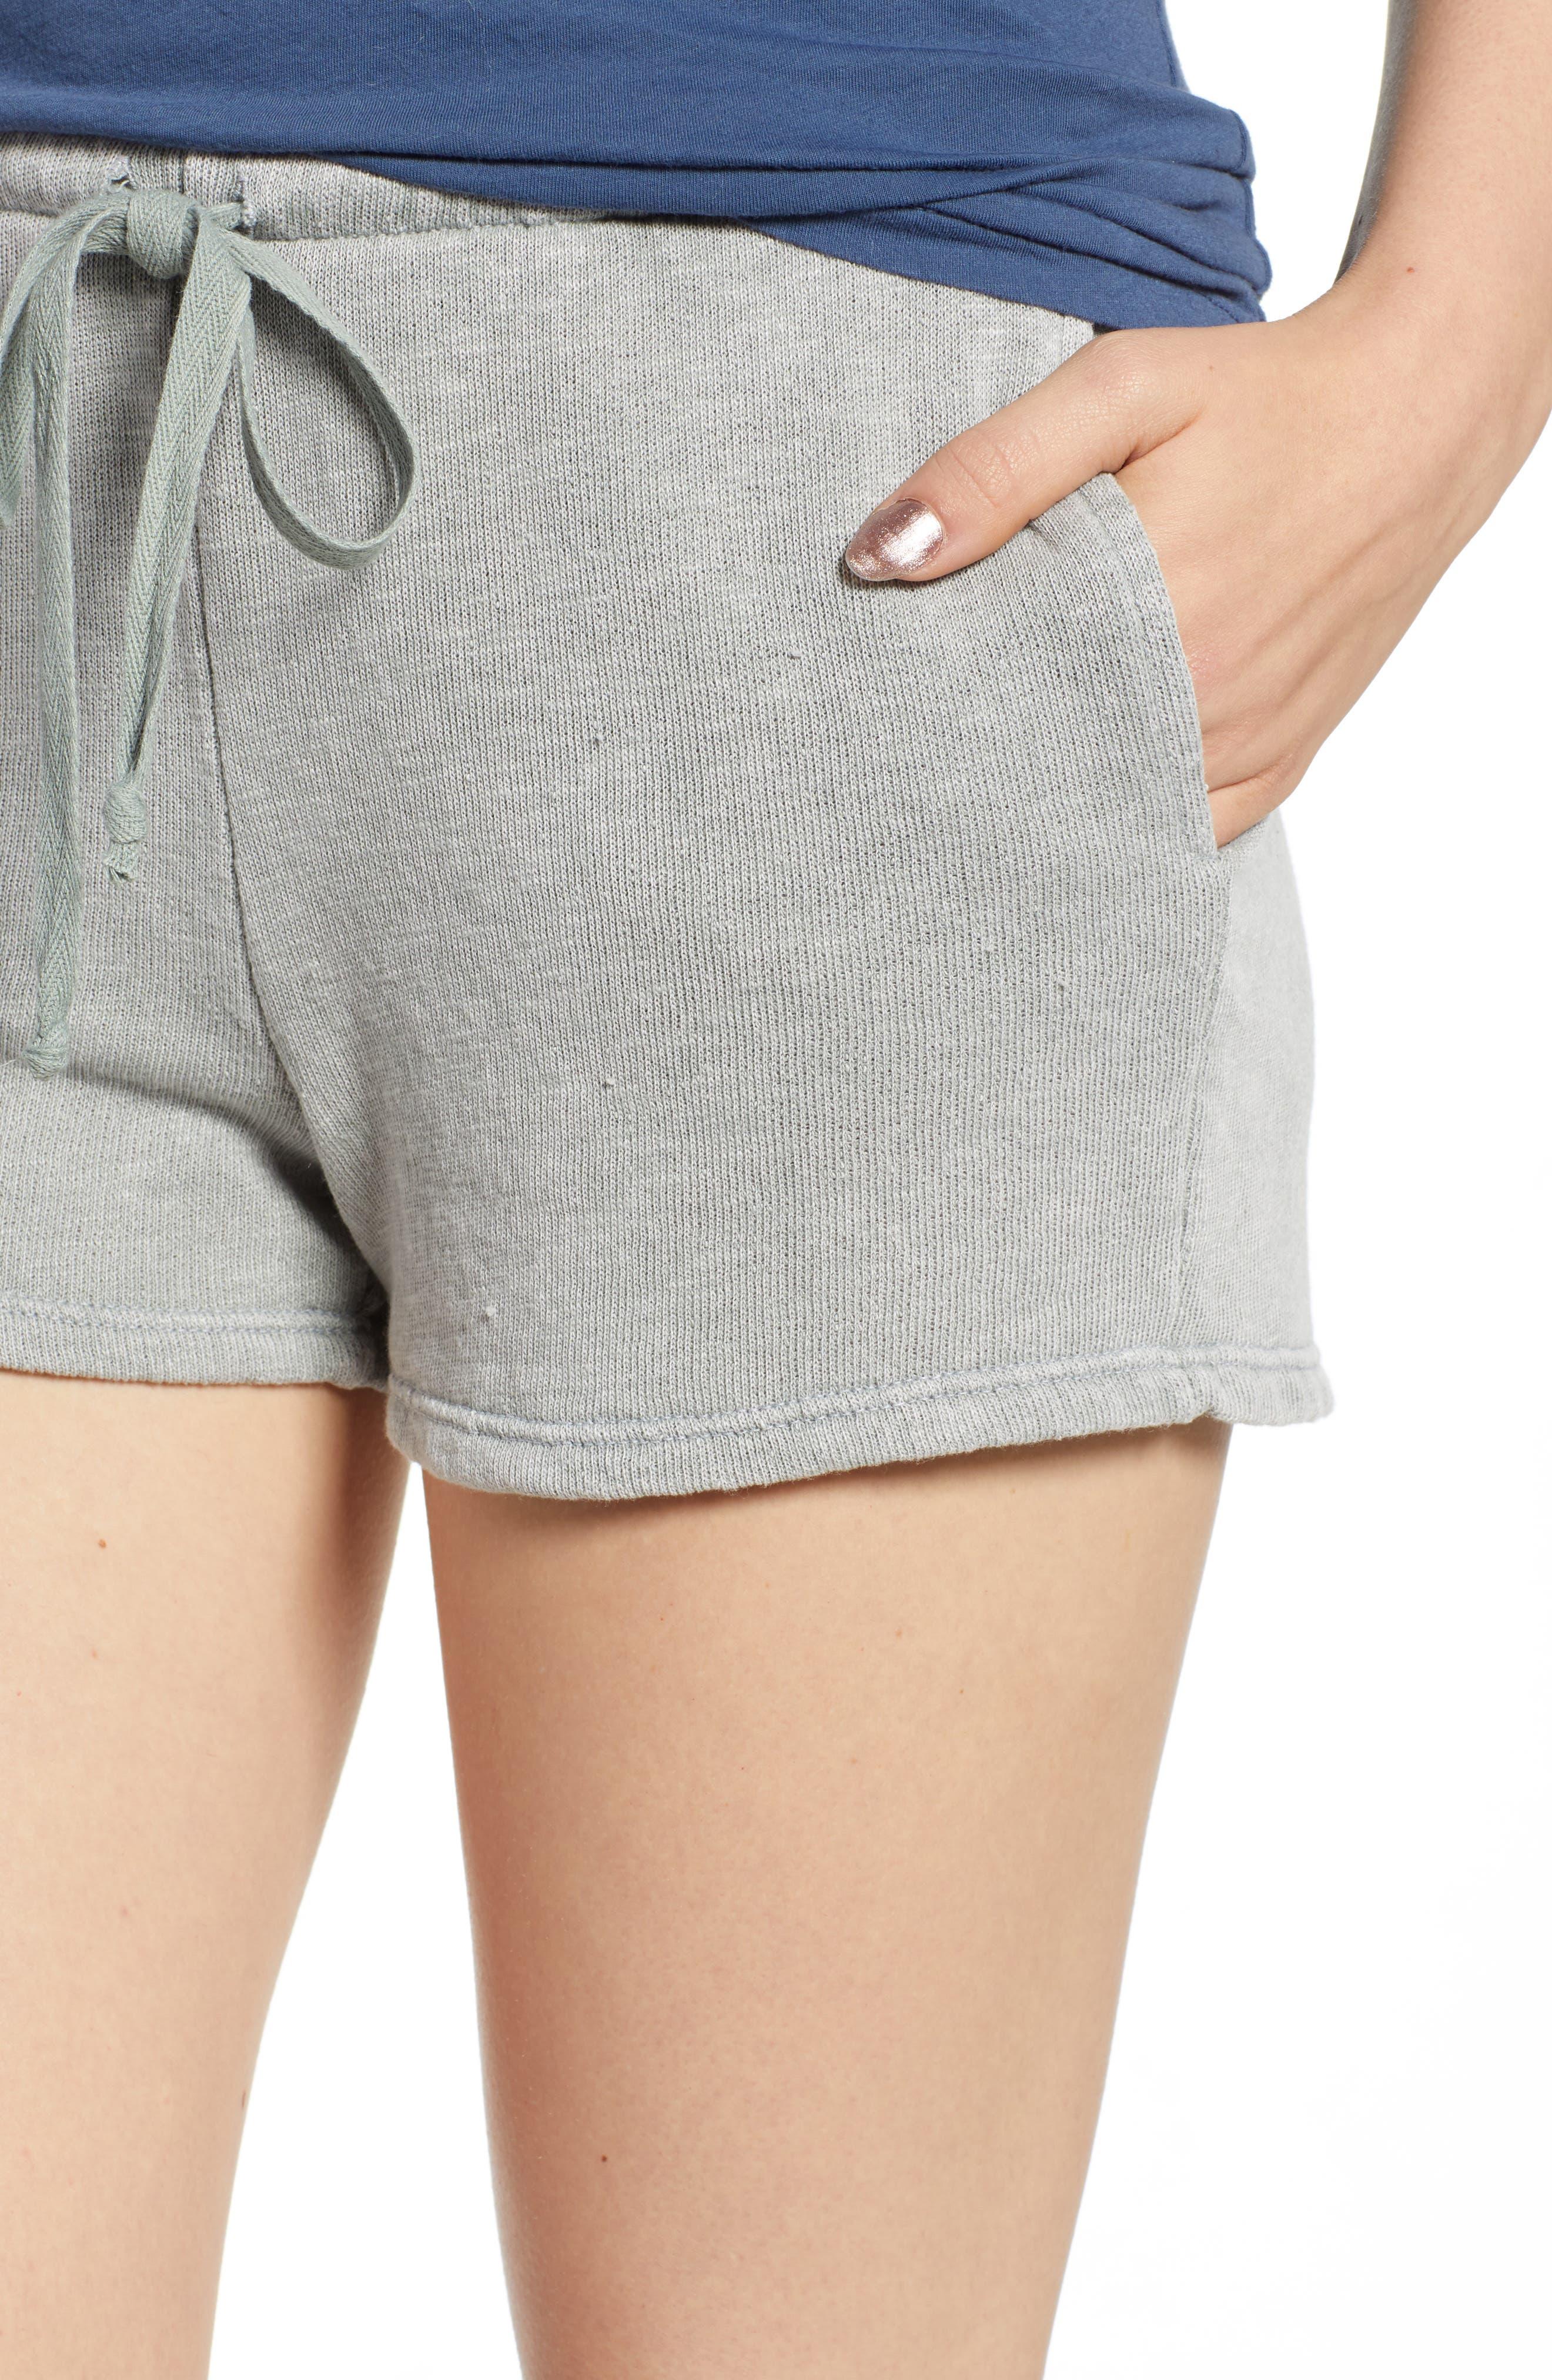 Kiama Shorts,                             Alternate thumbnail 4, color,                             FADED MOSS